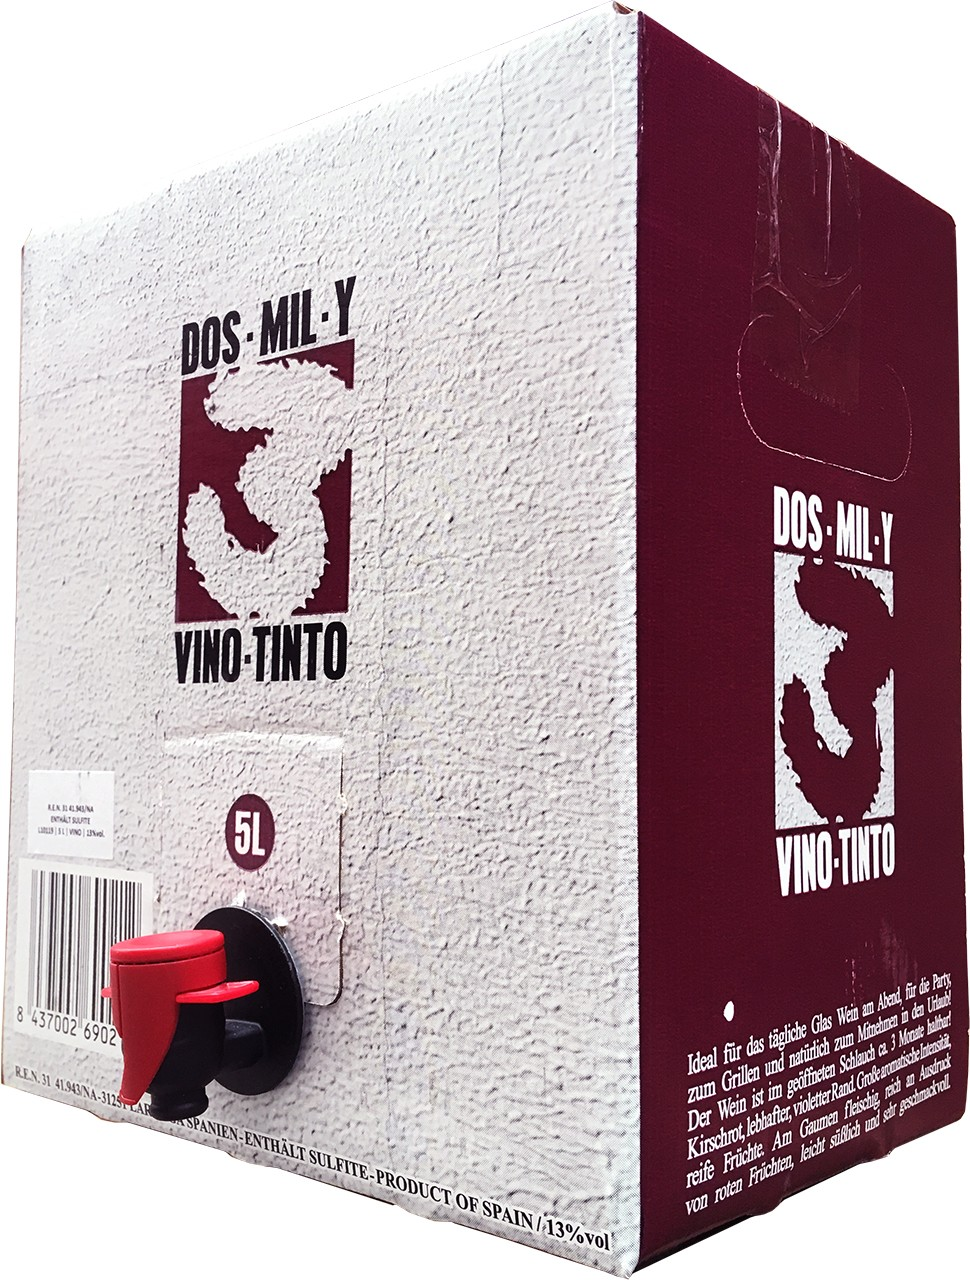 2003 - Dos Mil y Tres Tinto - Rotwein - Navarra - Spanien - 5 L Bag in Box